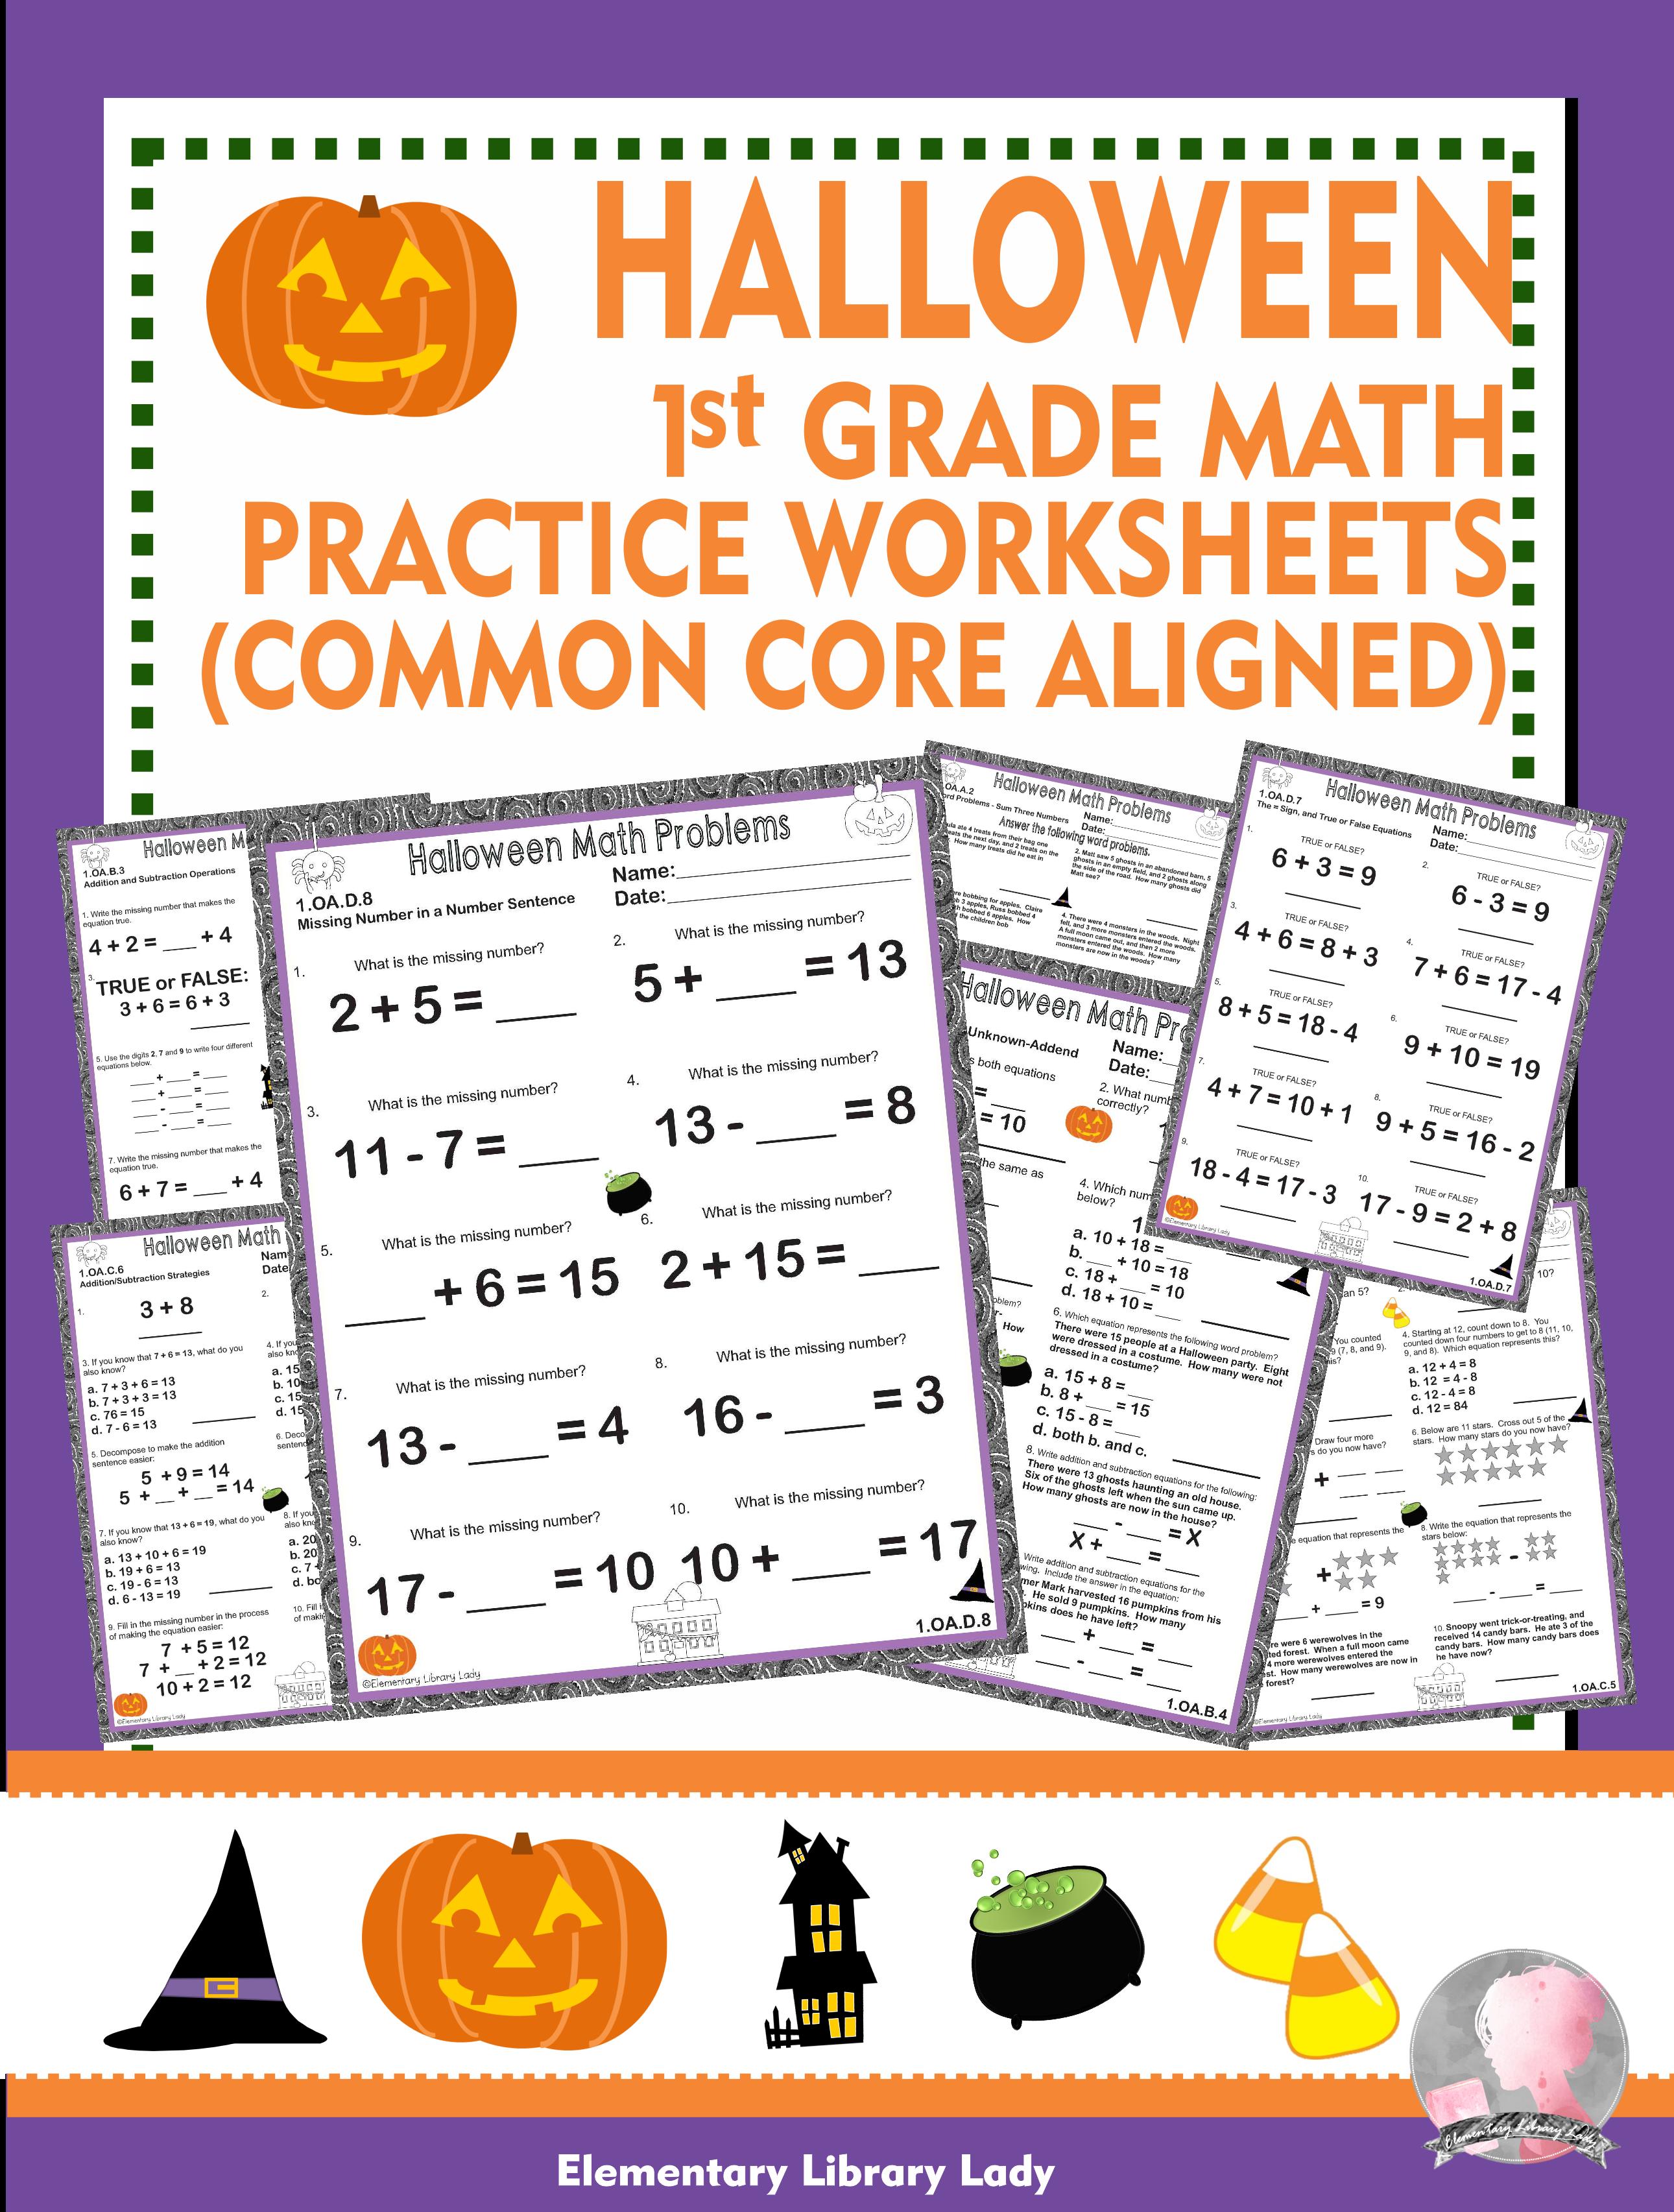 Halloween 1st Grade Math Worksheets Common Core 1 Oa 1st Grade Math Worksheets 1st Grade Math Common Core [ 3410 x 2581 Pixel ]